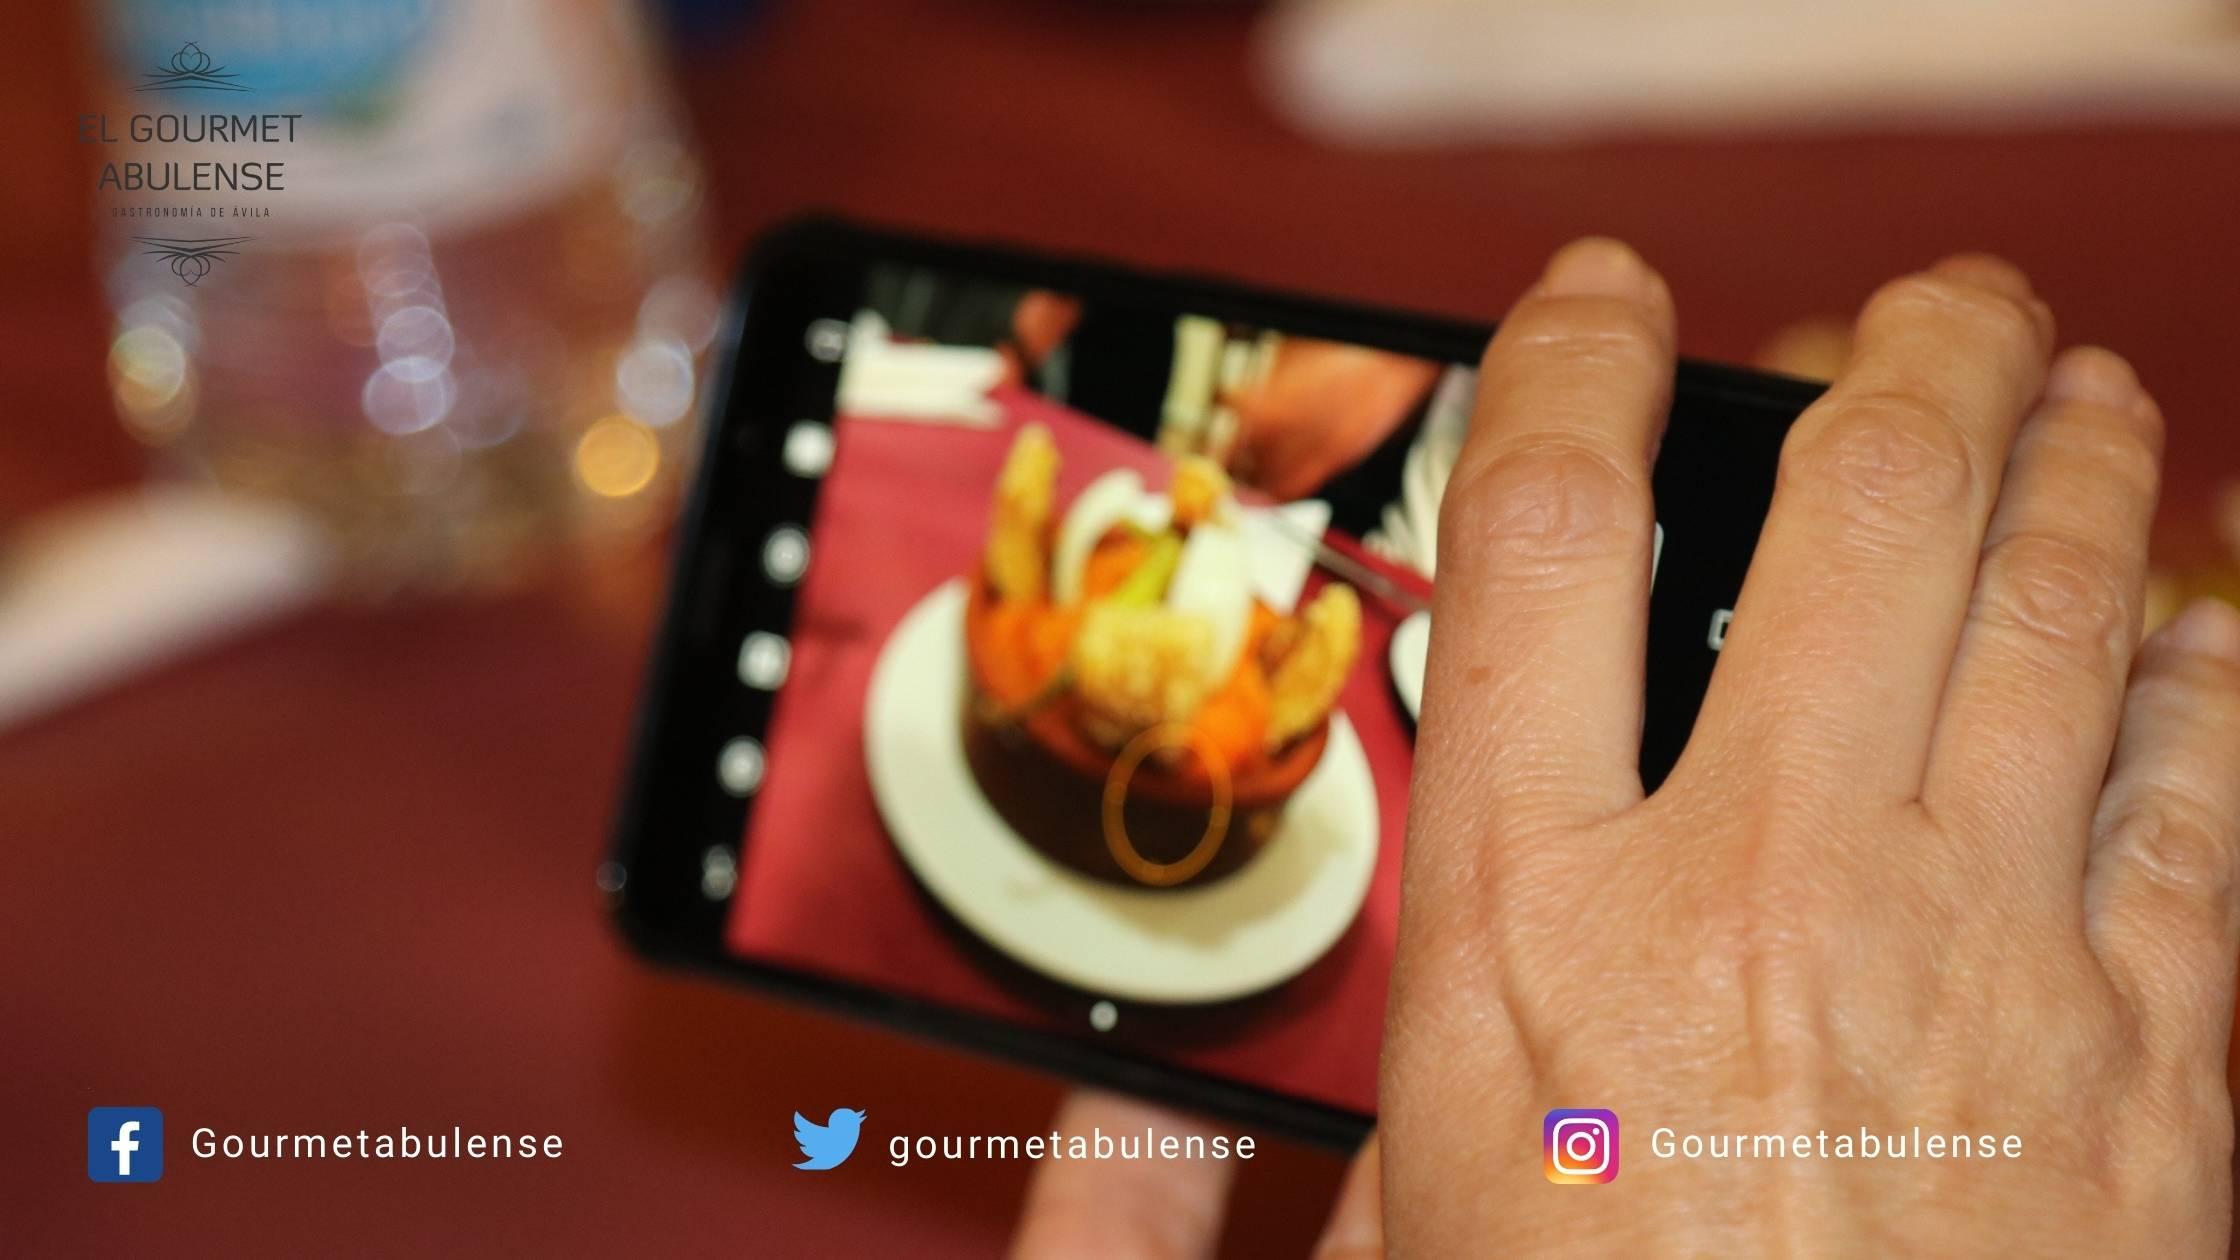 Gourmetabulense (6)